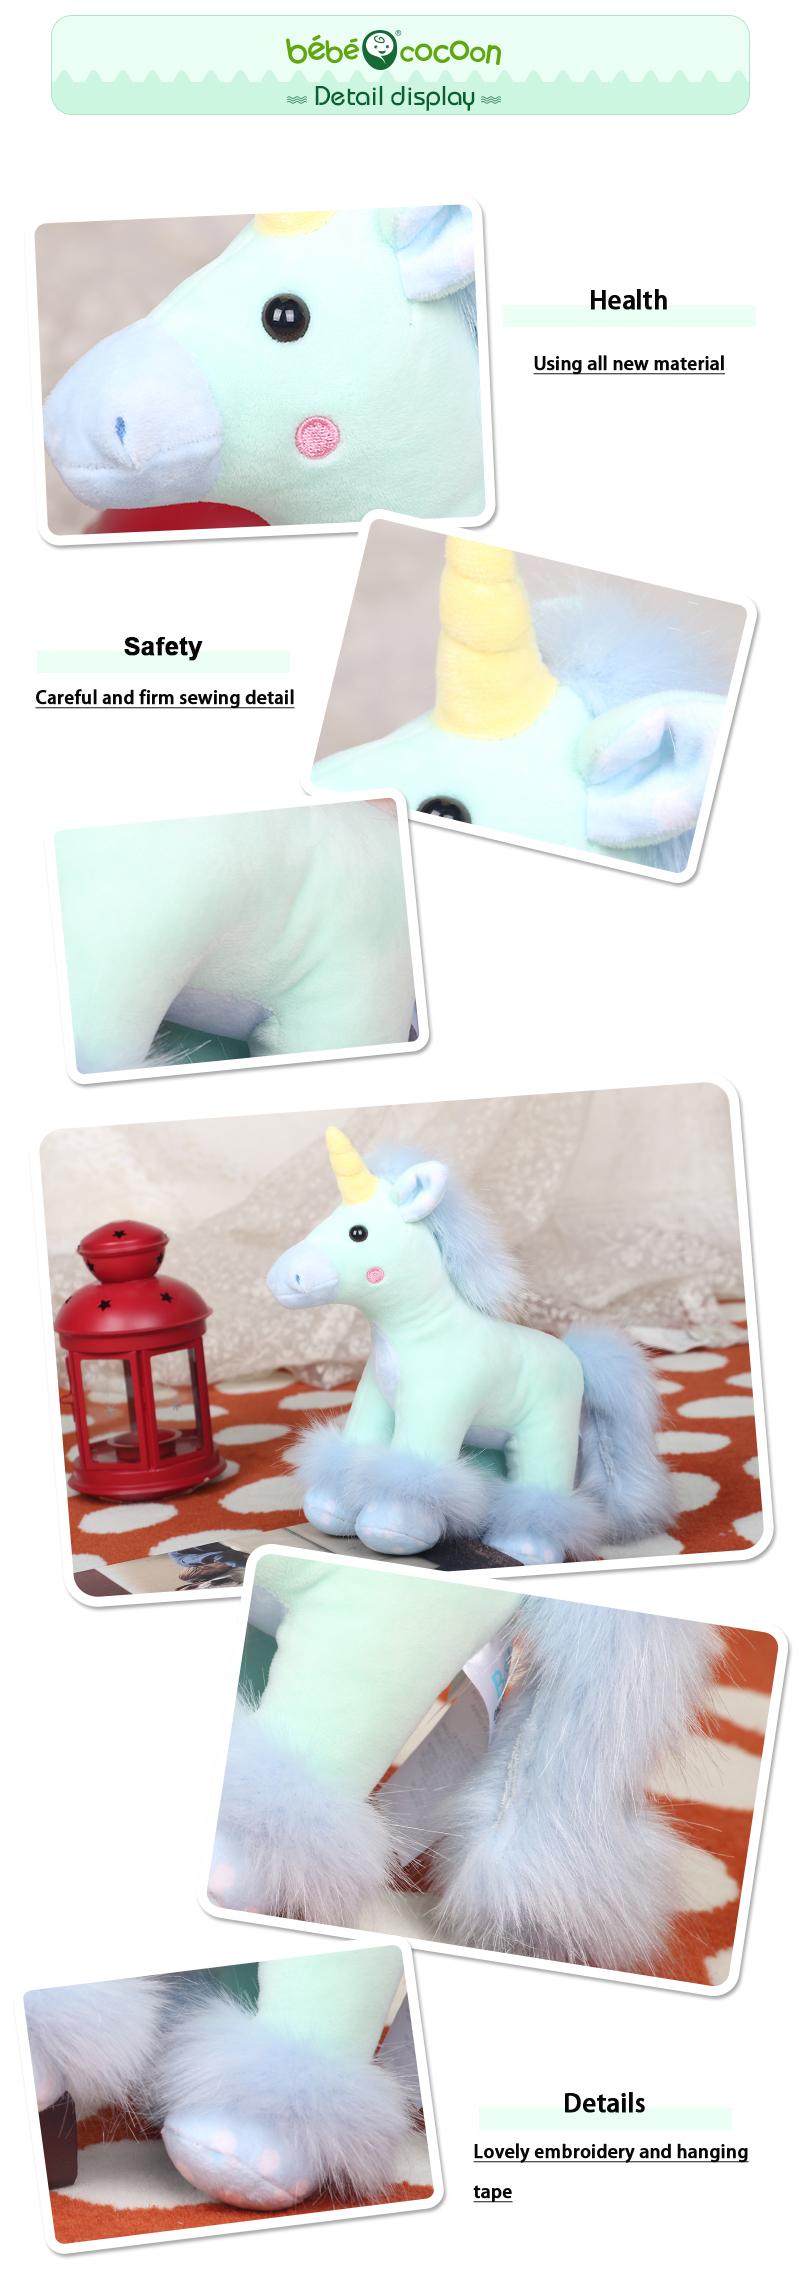 Green-Unicorn-6-12_03